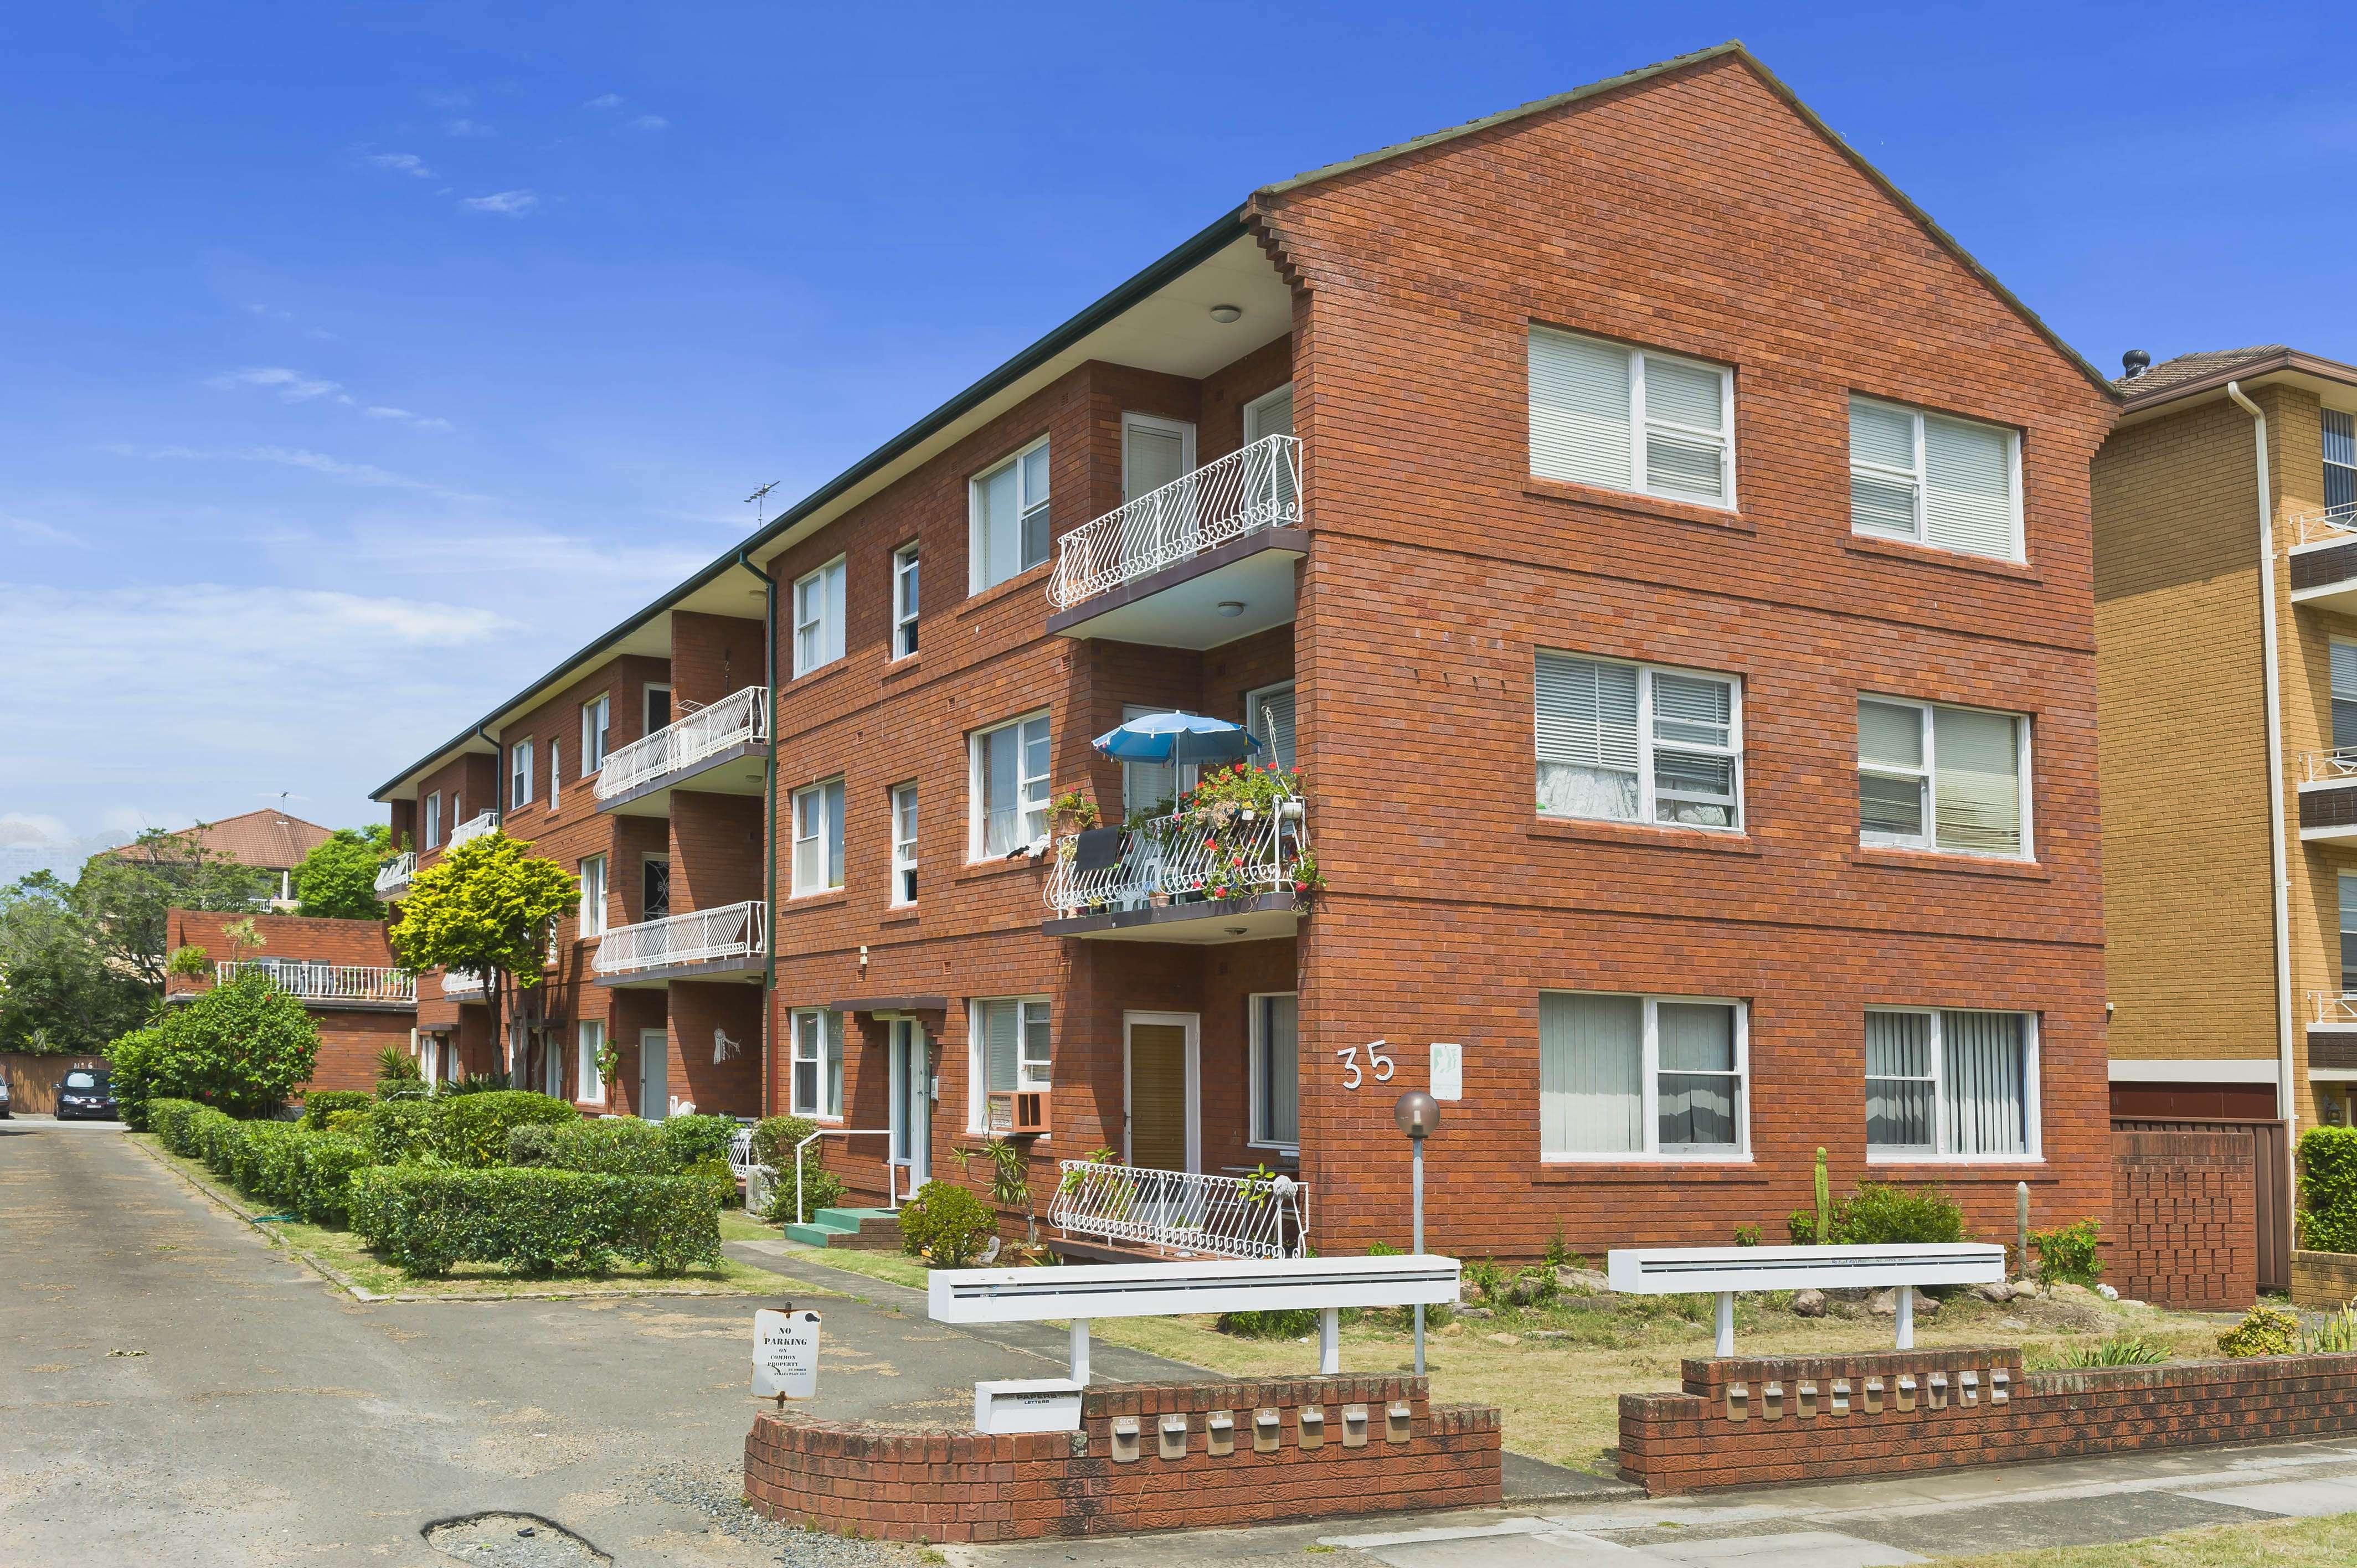 7/35 Banks St, Monterey NSW 2217